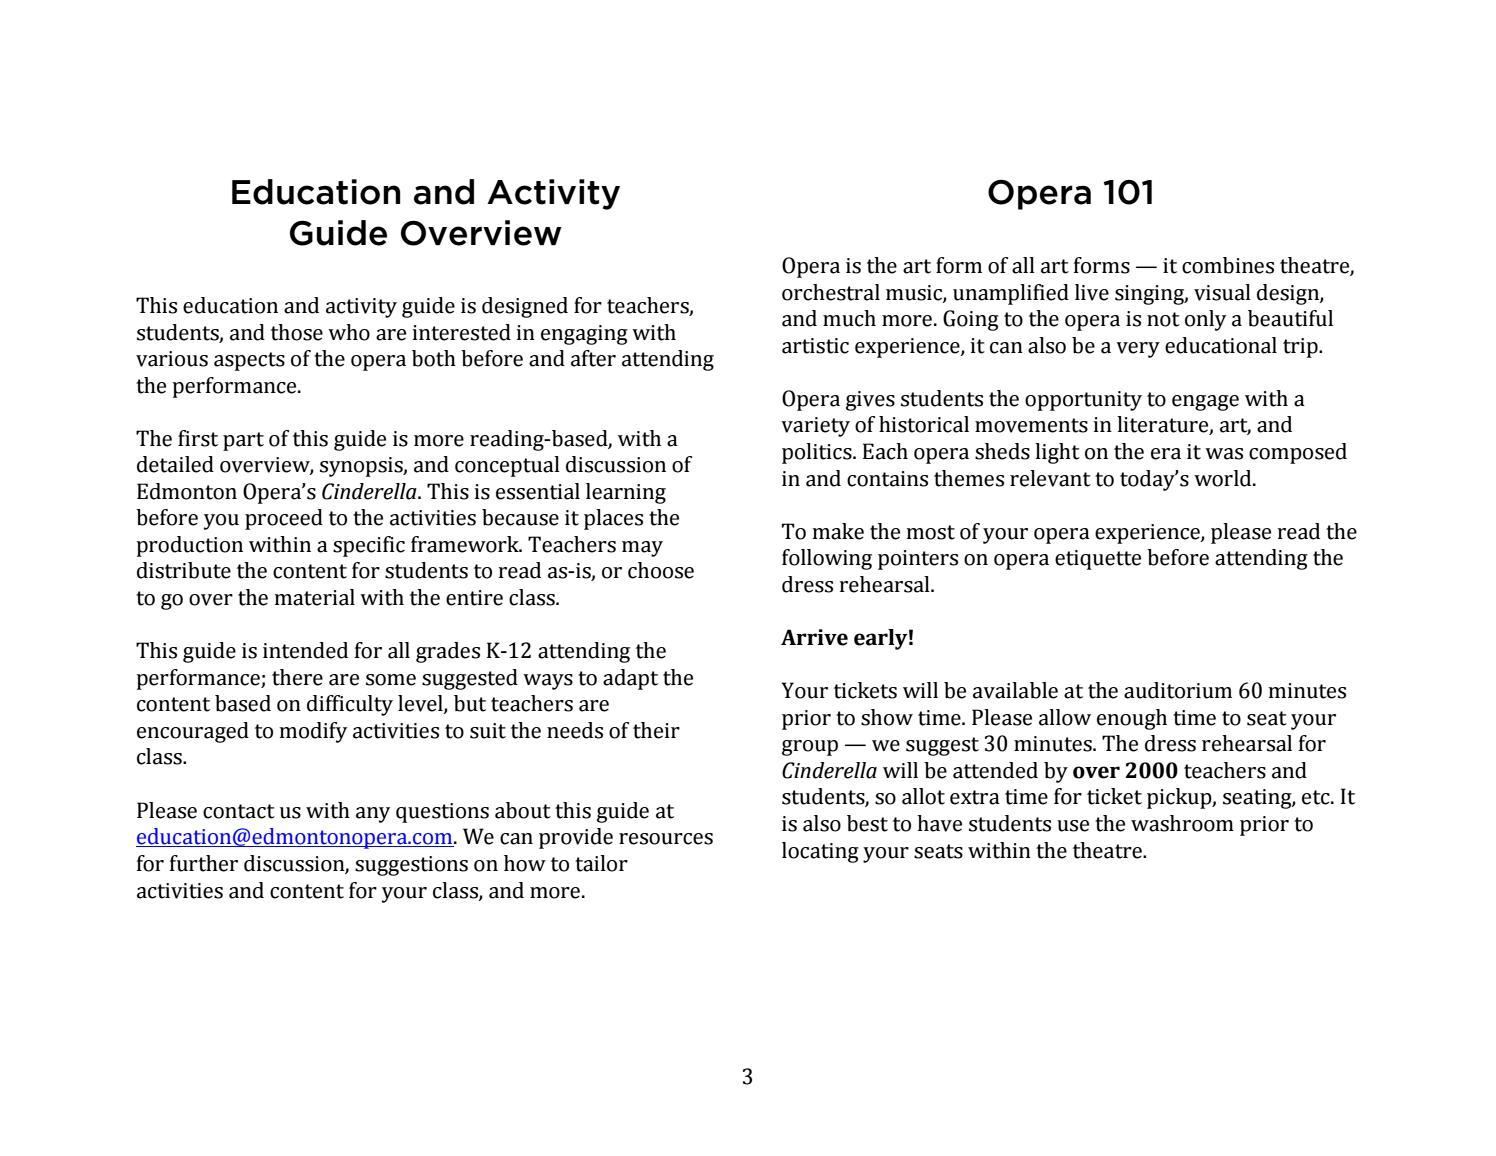 cinderella education activity guide by edmonton opera issuu rh issuu com